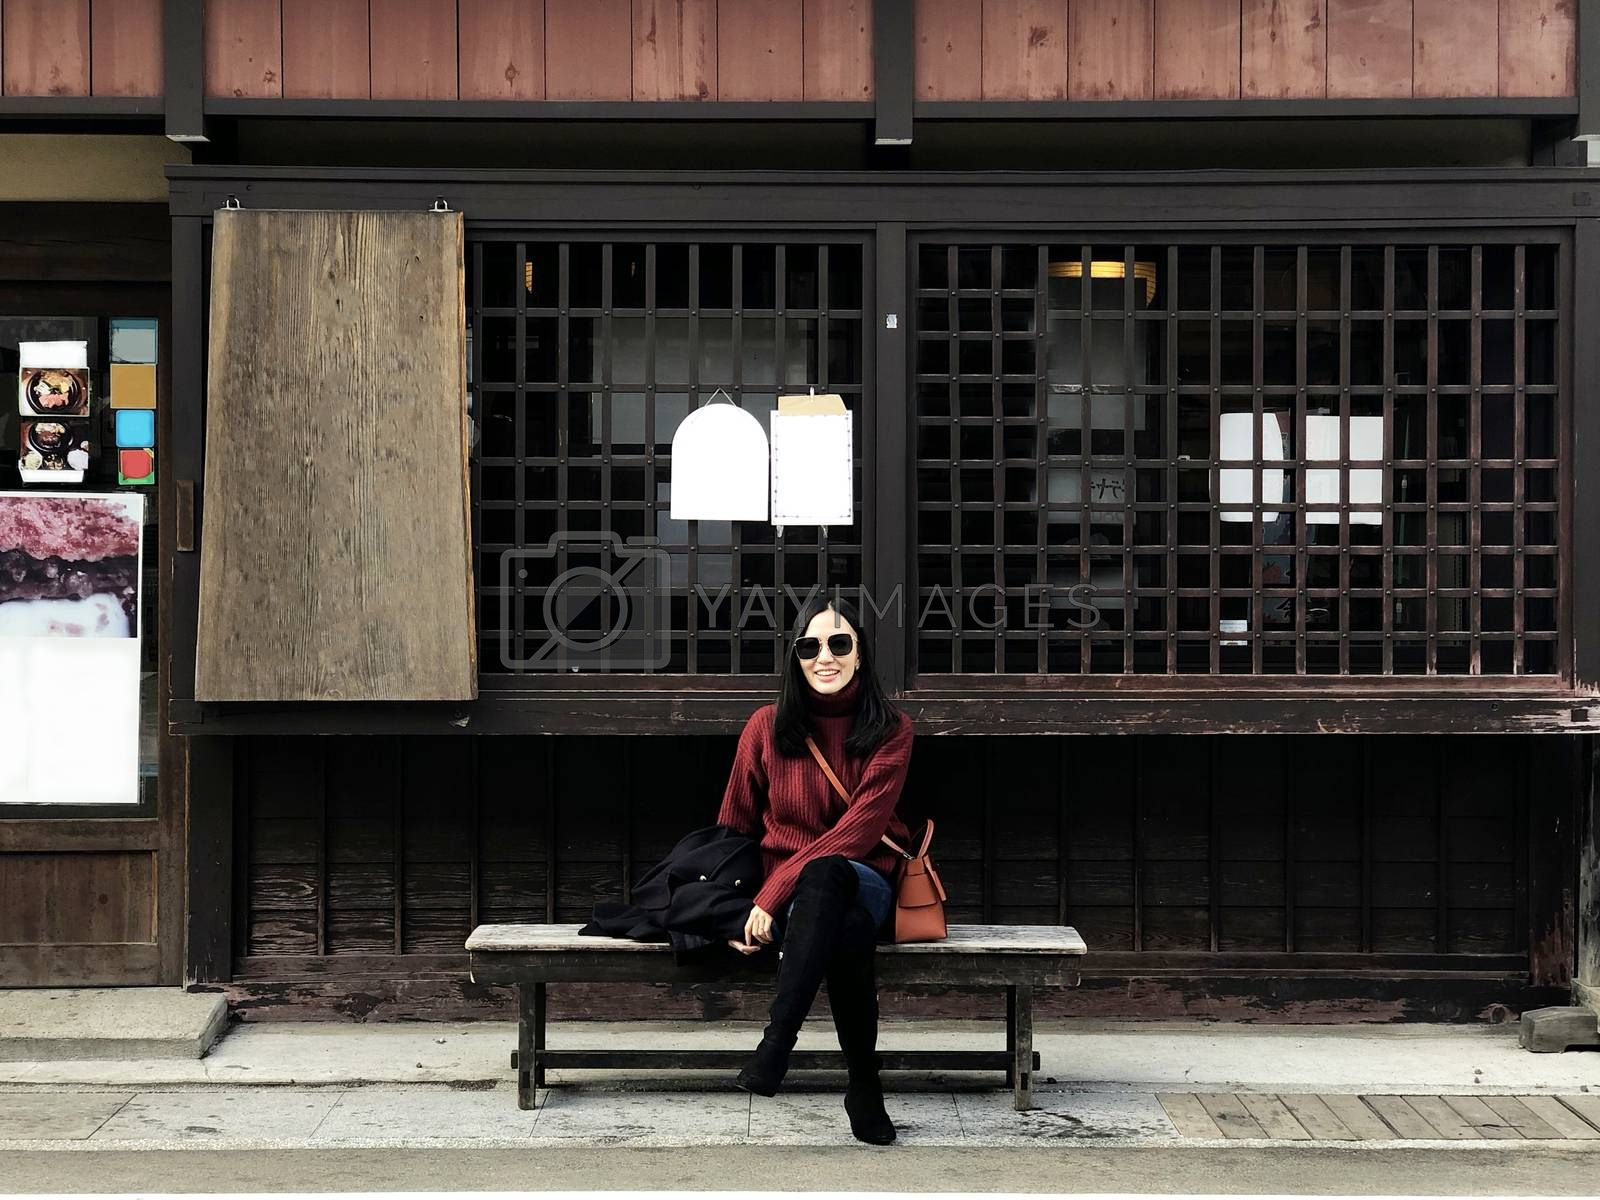 Happy woman tourist enjoy view in old twon street city of Takayama, Japan